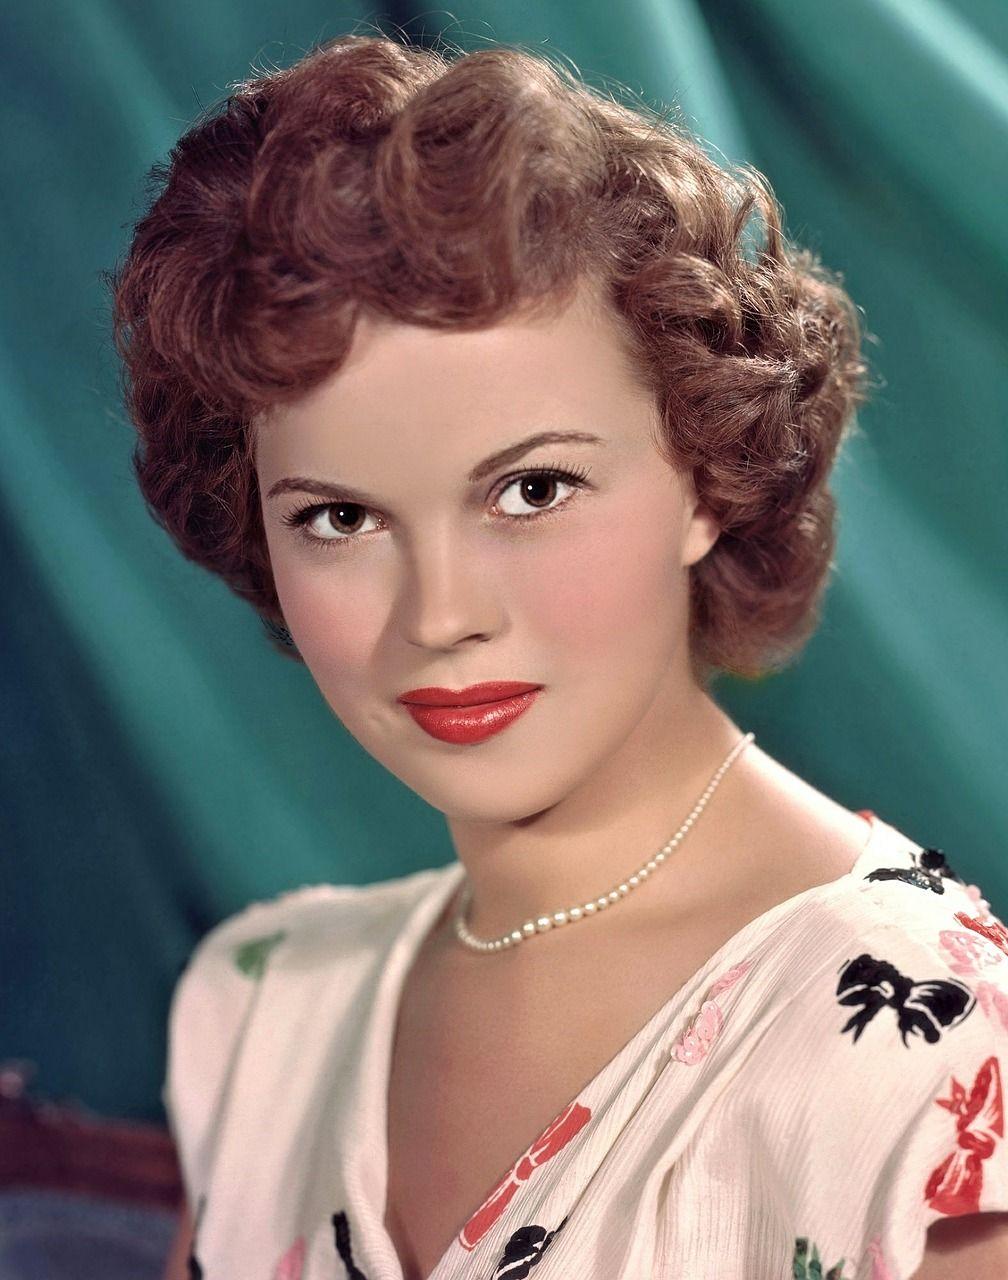 Shirley Temple Ann Es 40 Ann Es 50 Actrice R Tro Collier De Perle Maquillage Vintage